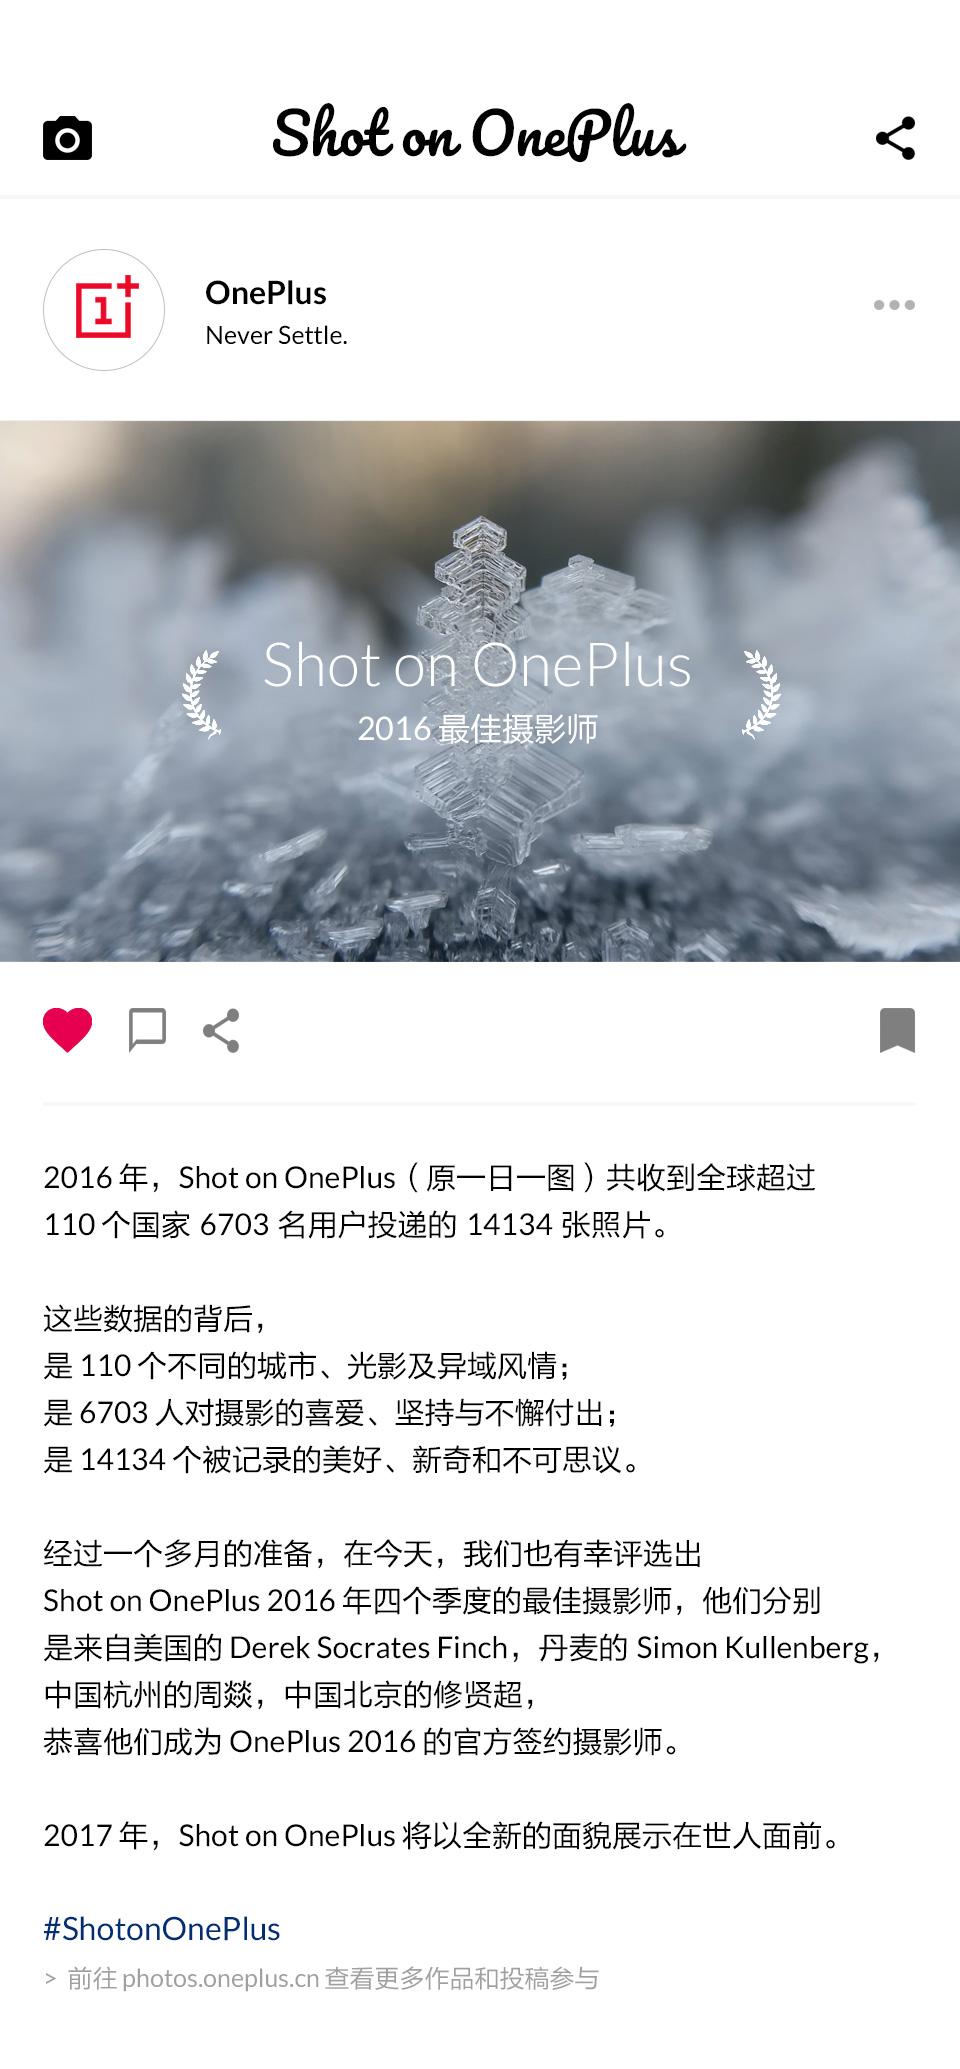 Shot on OnePlus 2016 最佳摄影师